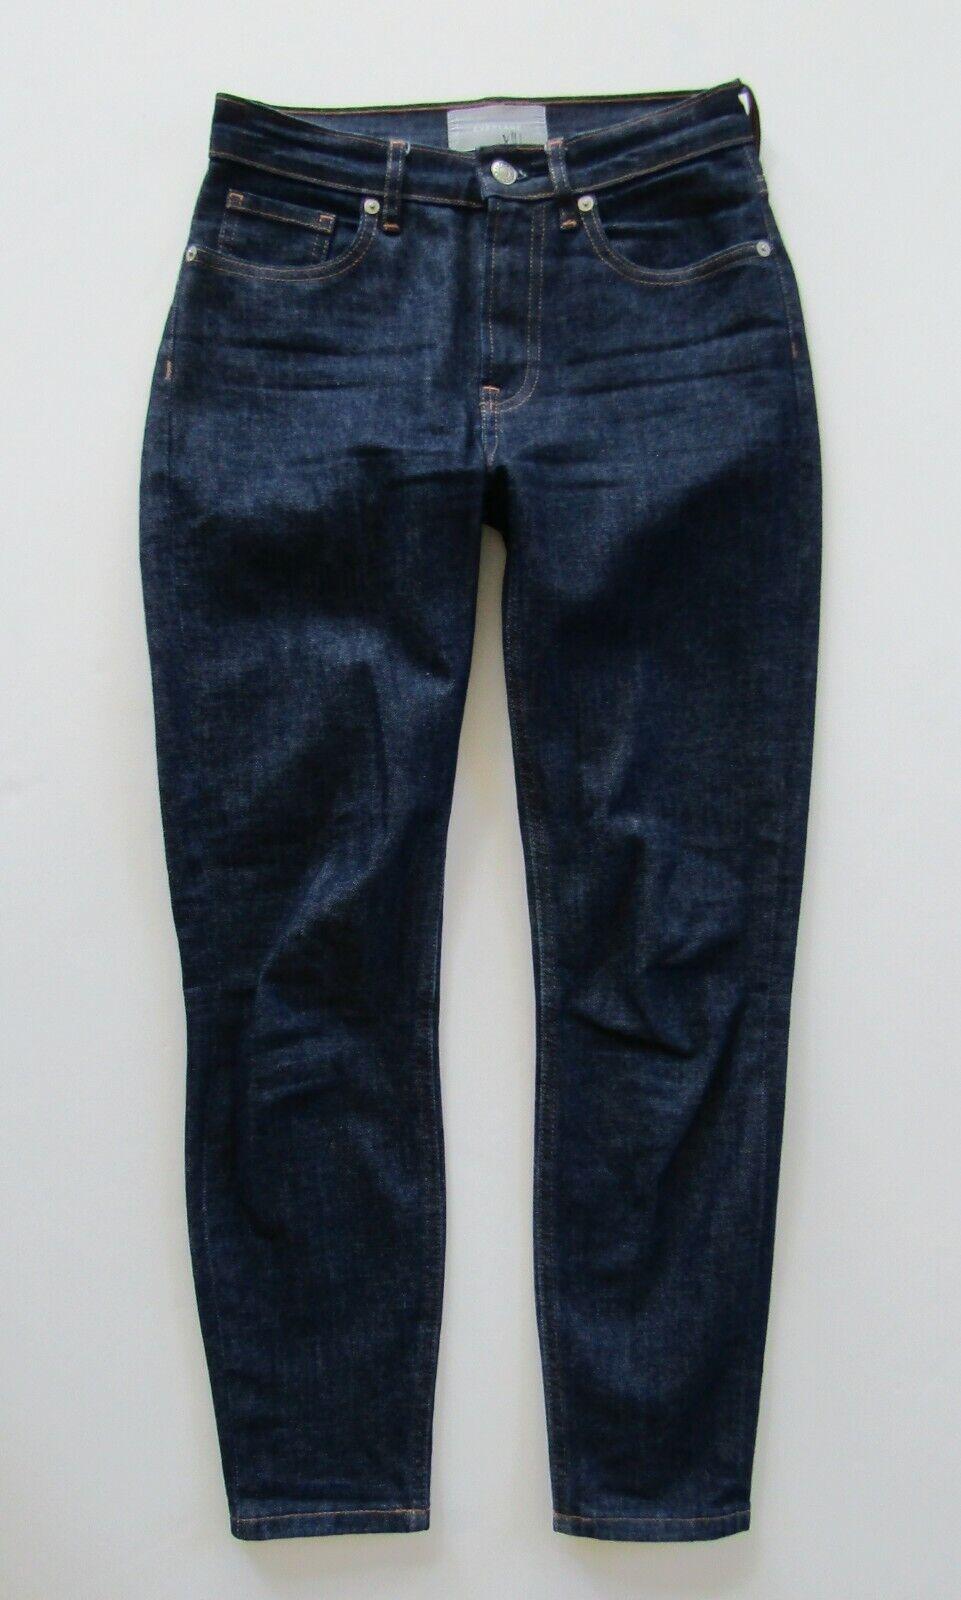 EVERLANE High Rise Skinny Ankle Crop Jean, Dark Wash - Size 25